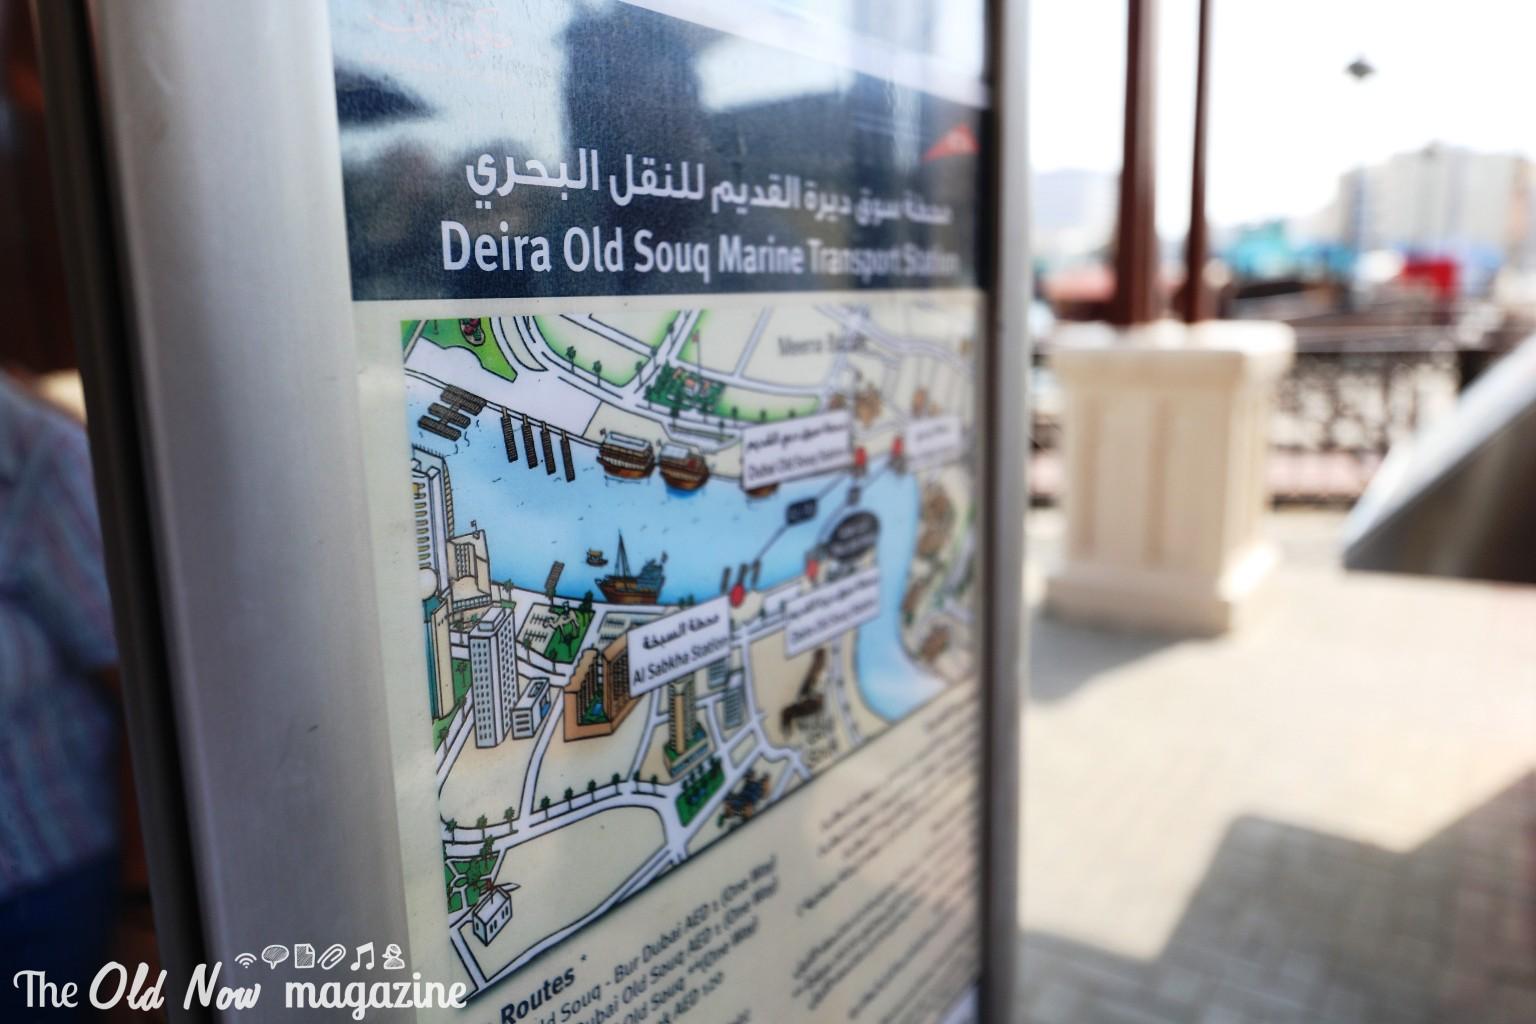 DUBAY DAY2 THEOLDNOW (91)